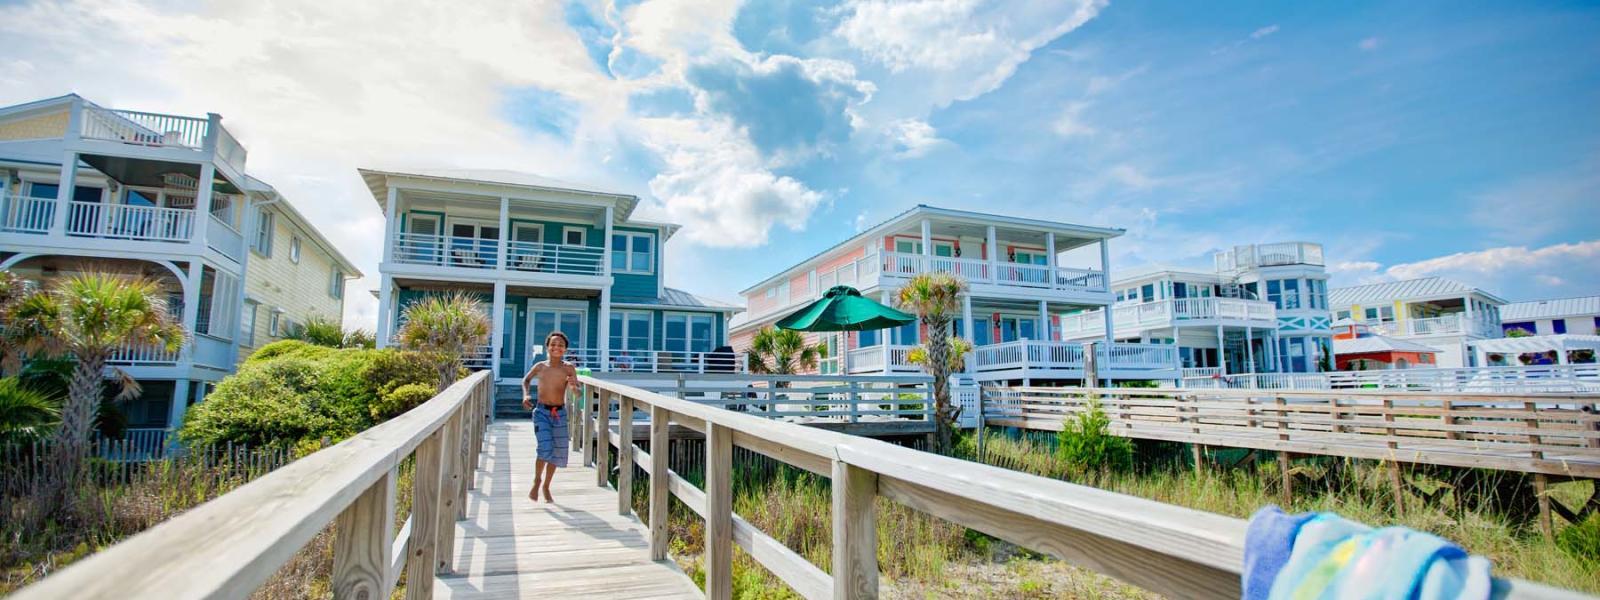 Vacation Als Wilmington Nc Official Tourism Site